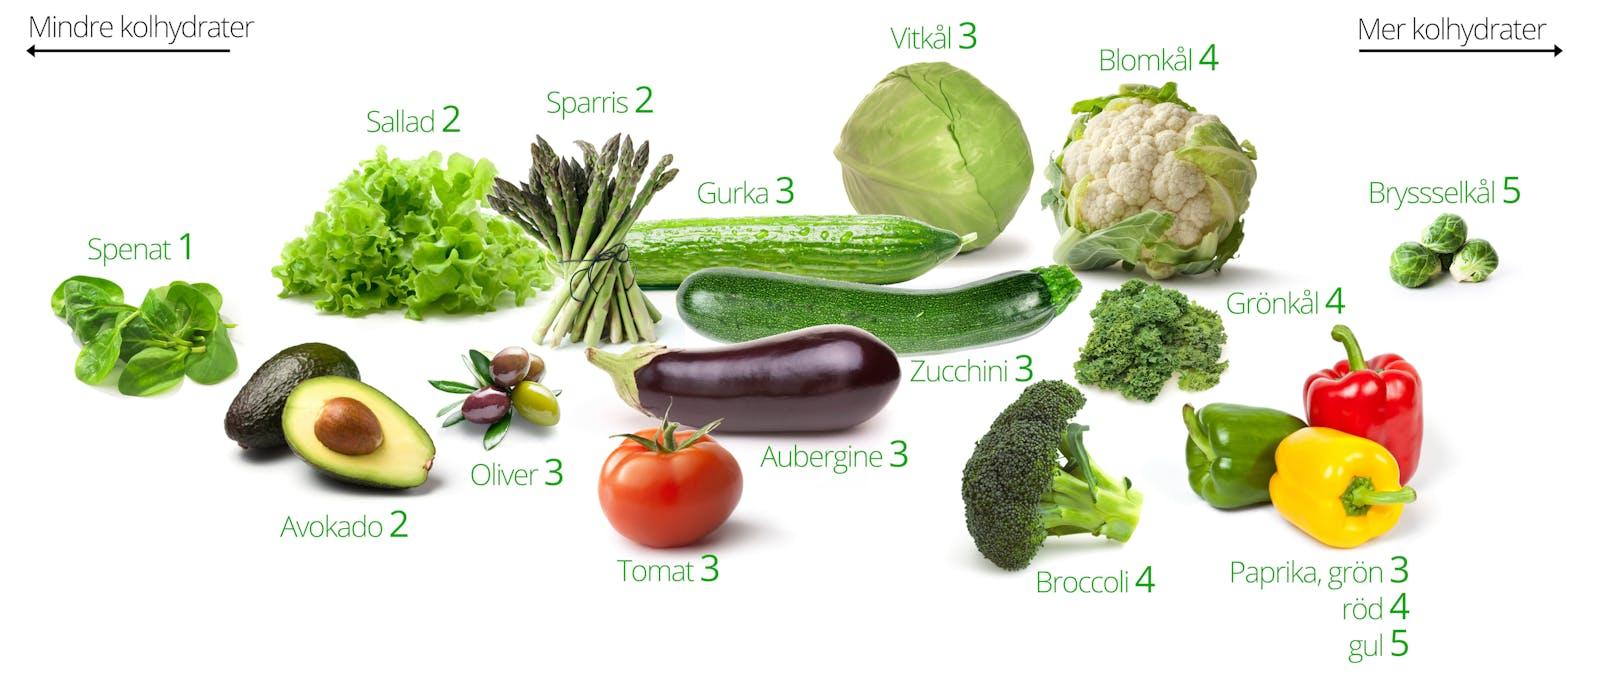 gröna linser kolhydrater